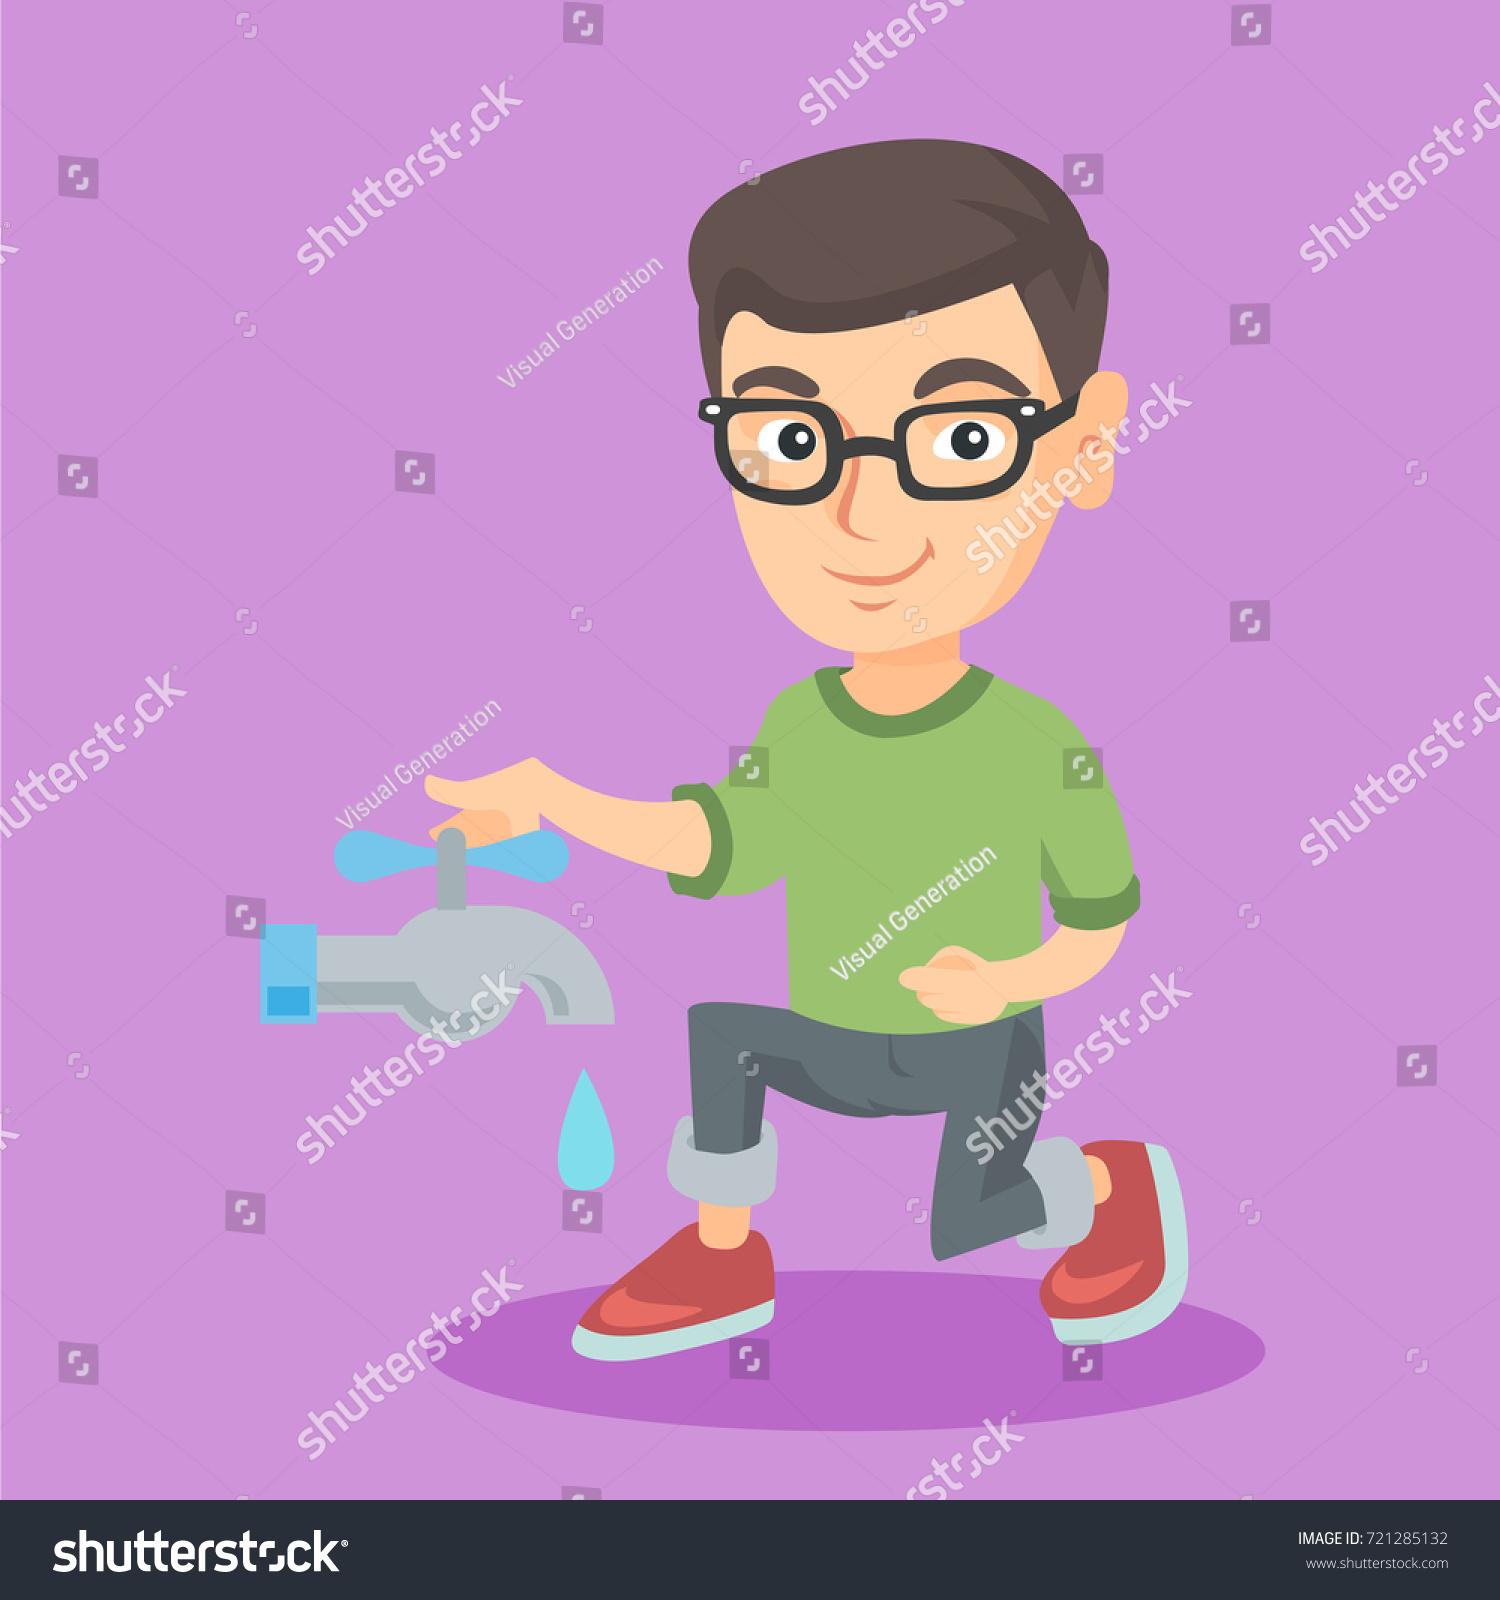 Vector de stock (libre de regalías) sobre Un niño caucásico en gafas  apagando721285132